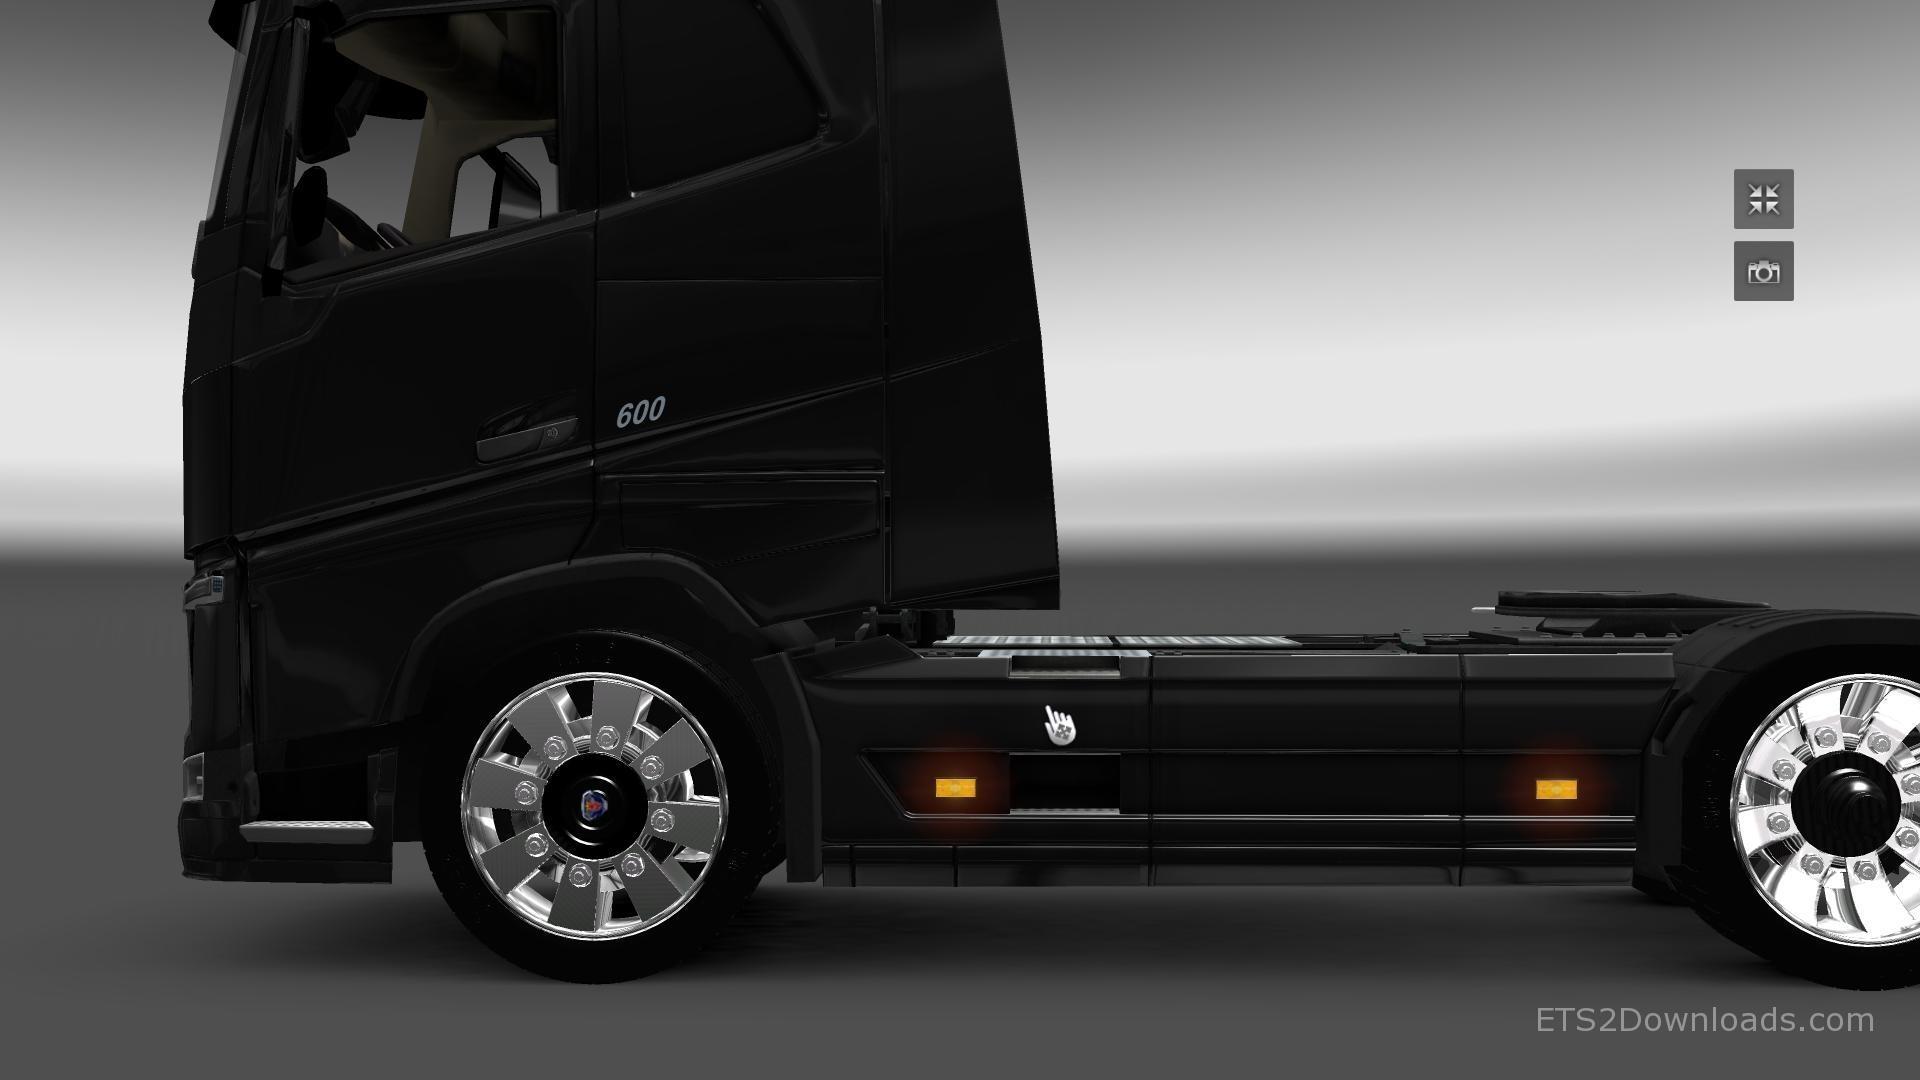 stax-wheels-for-all-trucks